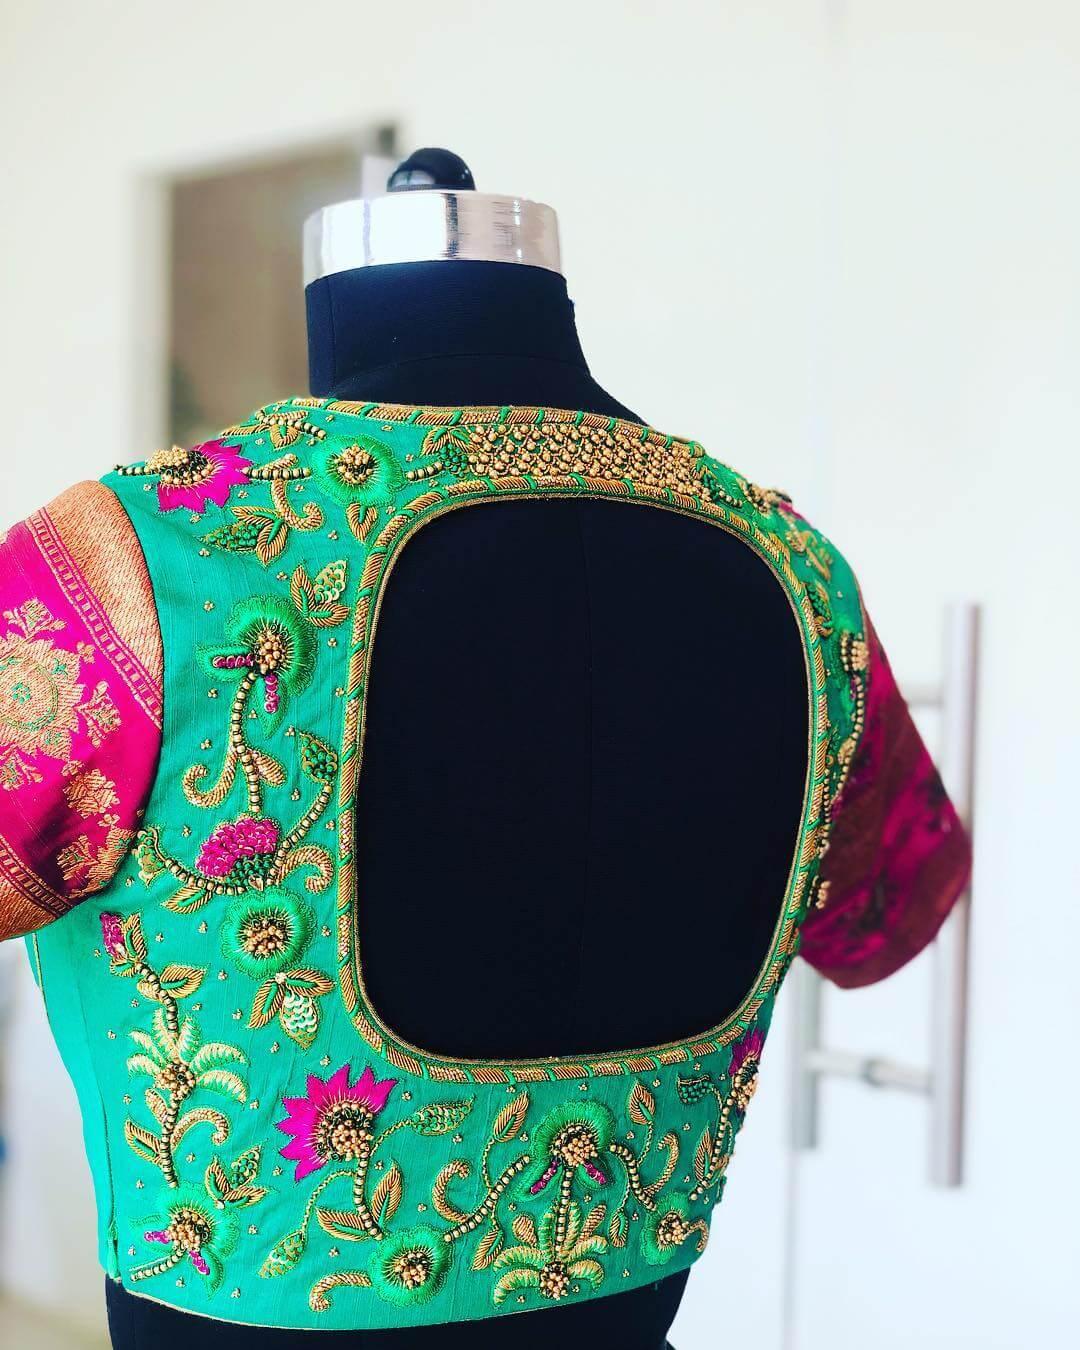 Mesmerising Aquamarine Blouse For South Indian Brides